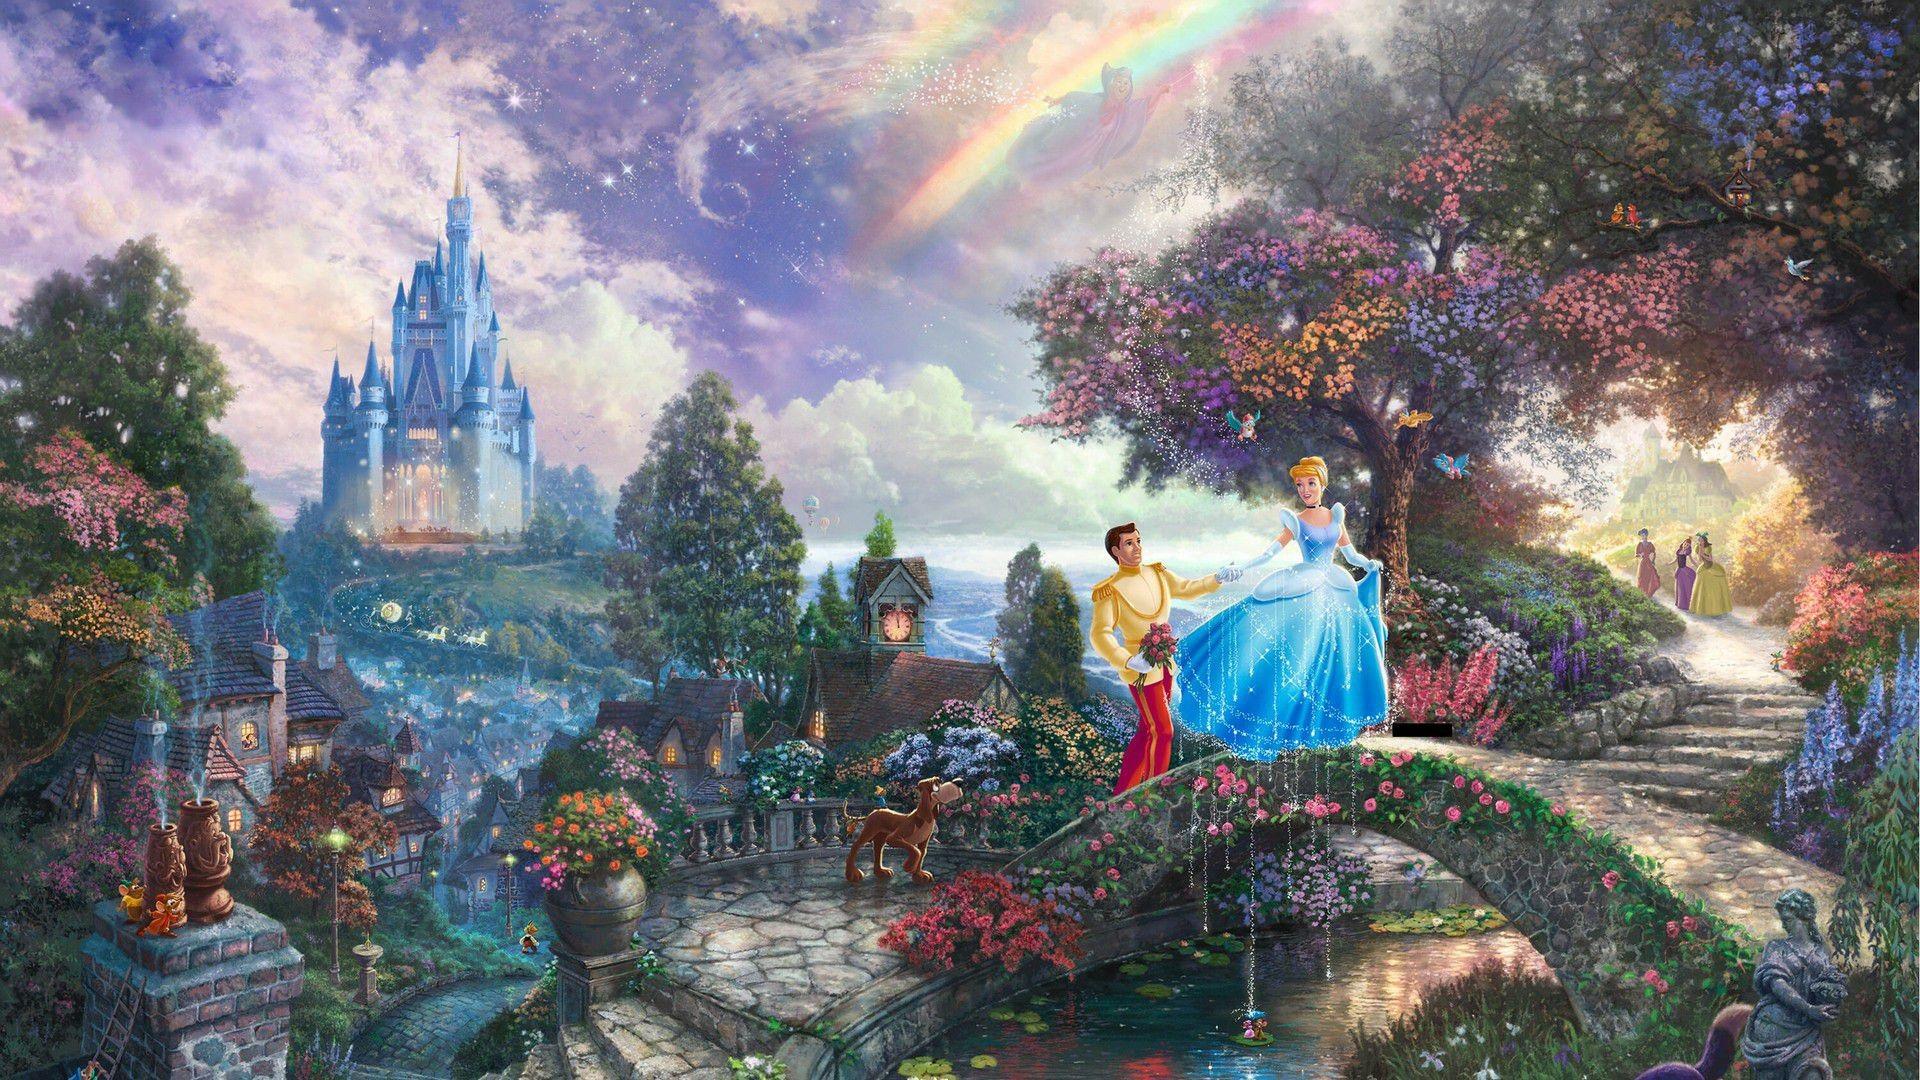 1920x1080 Disney Princess Cinderella Images Download Wallpapers